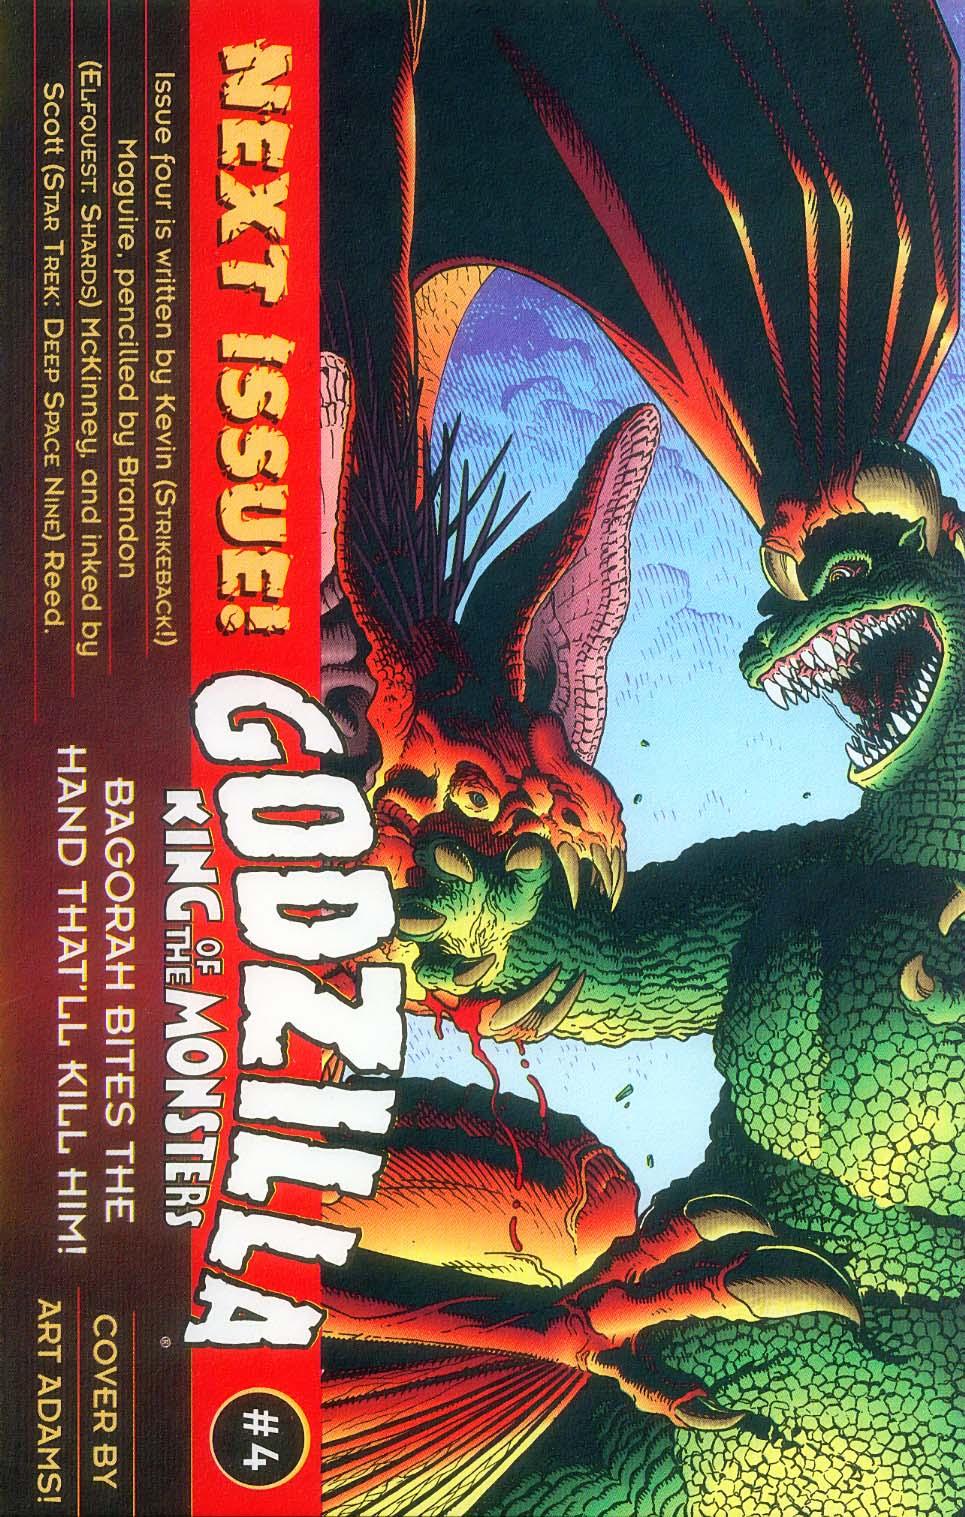 Godzilla (1995) Issue #3 #4 - English 27